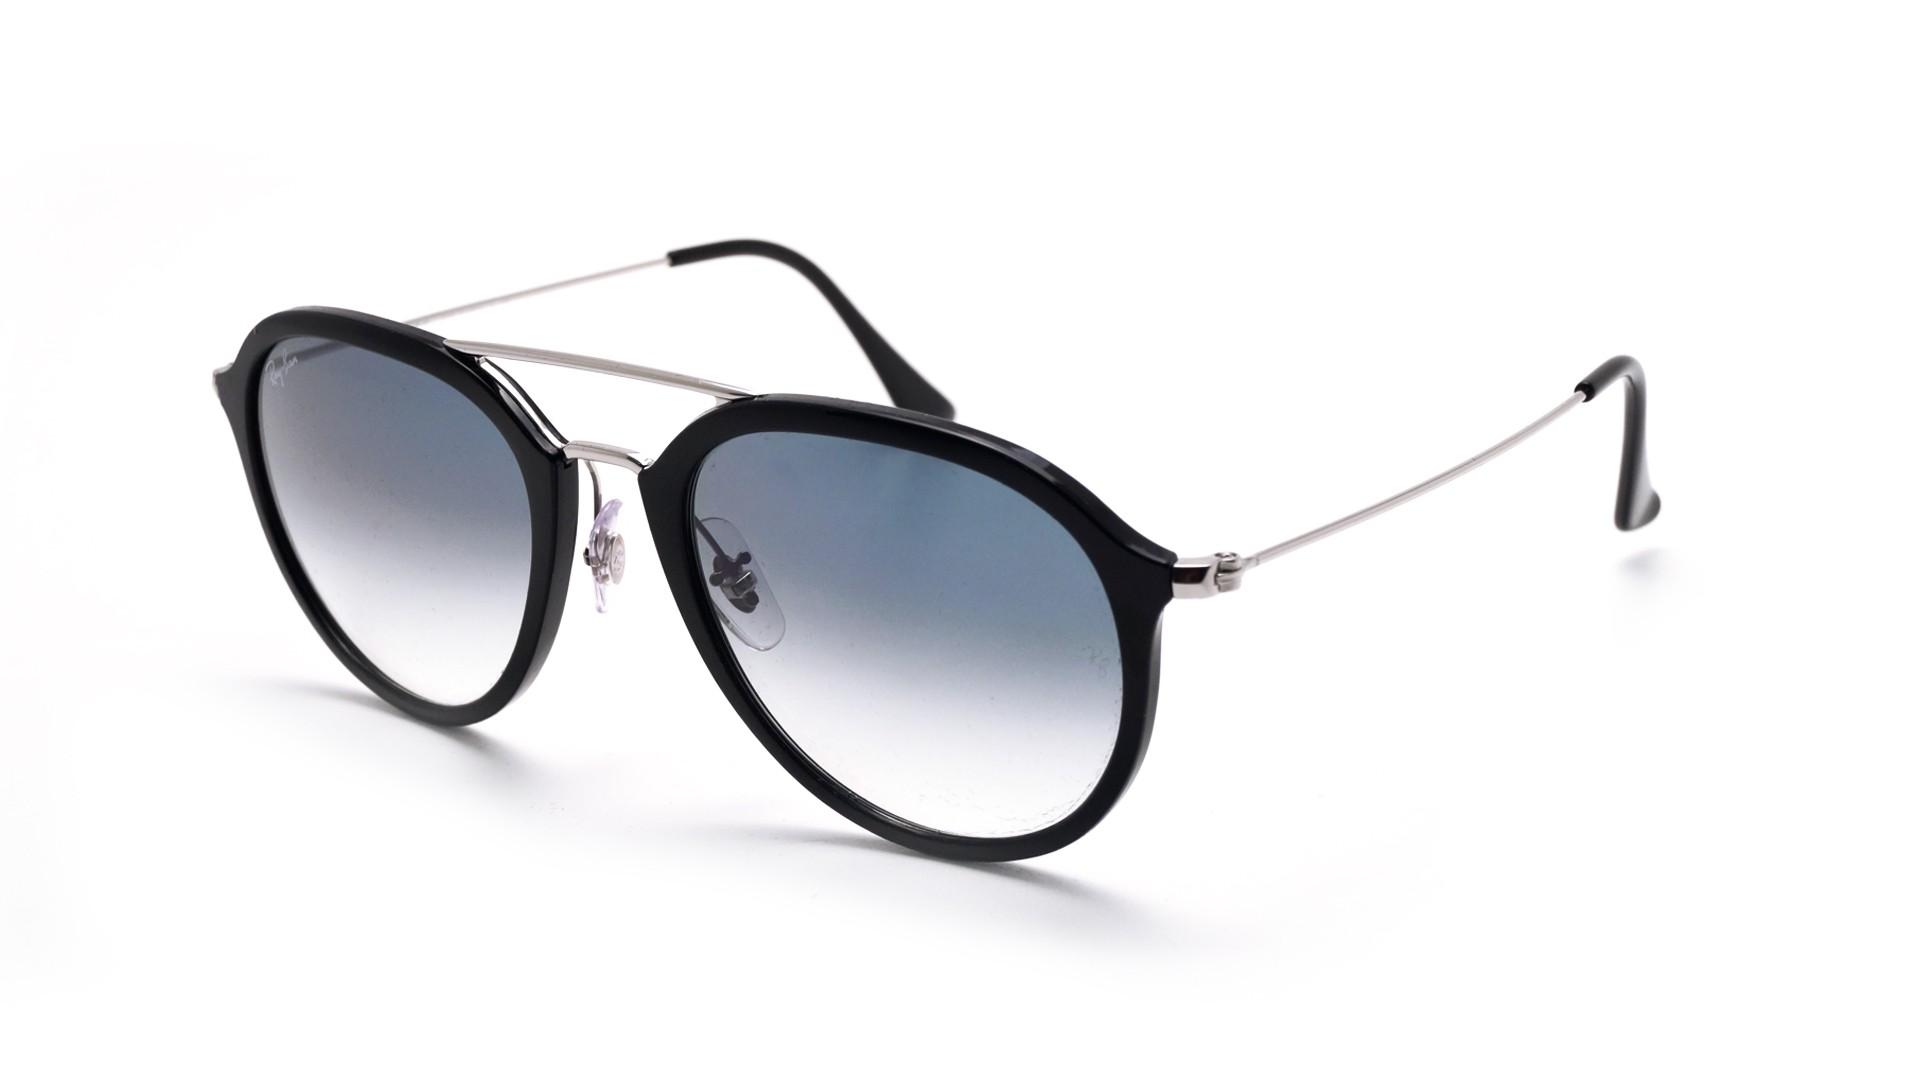 4b5bf9831 Sunglasses Ray-Ban Hiighstreet Black RB4253 62923F 53-21 Medium Gradient